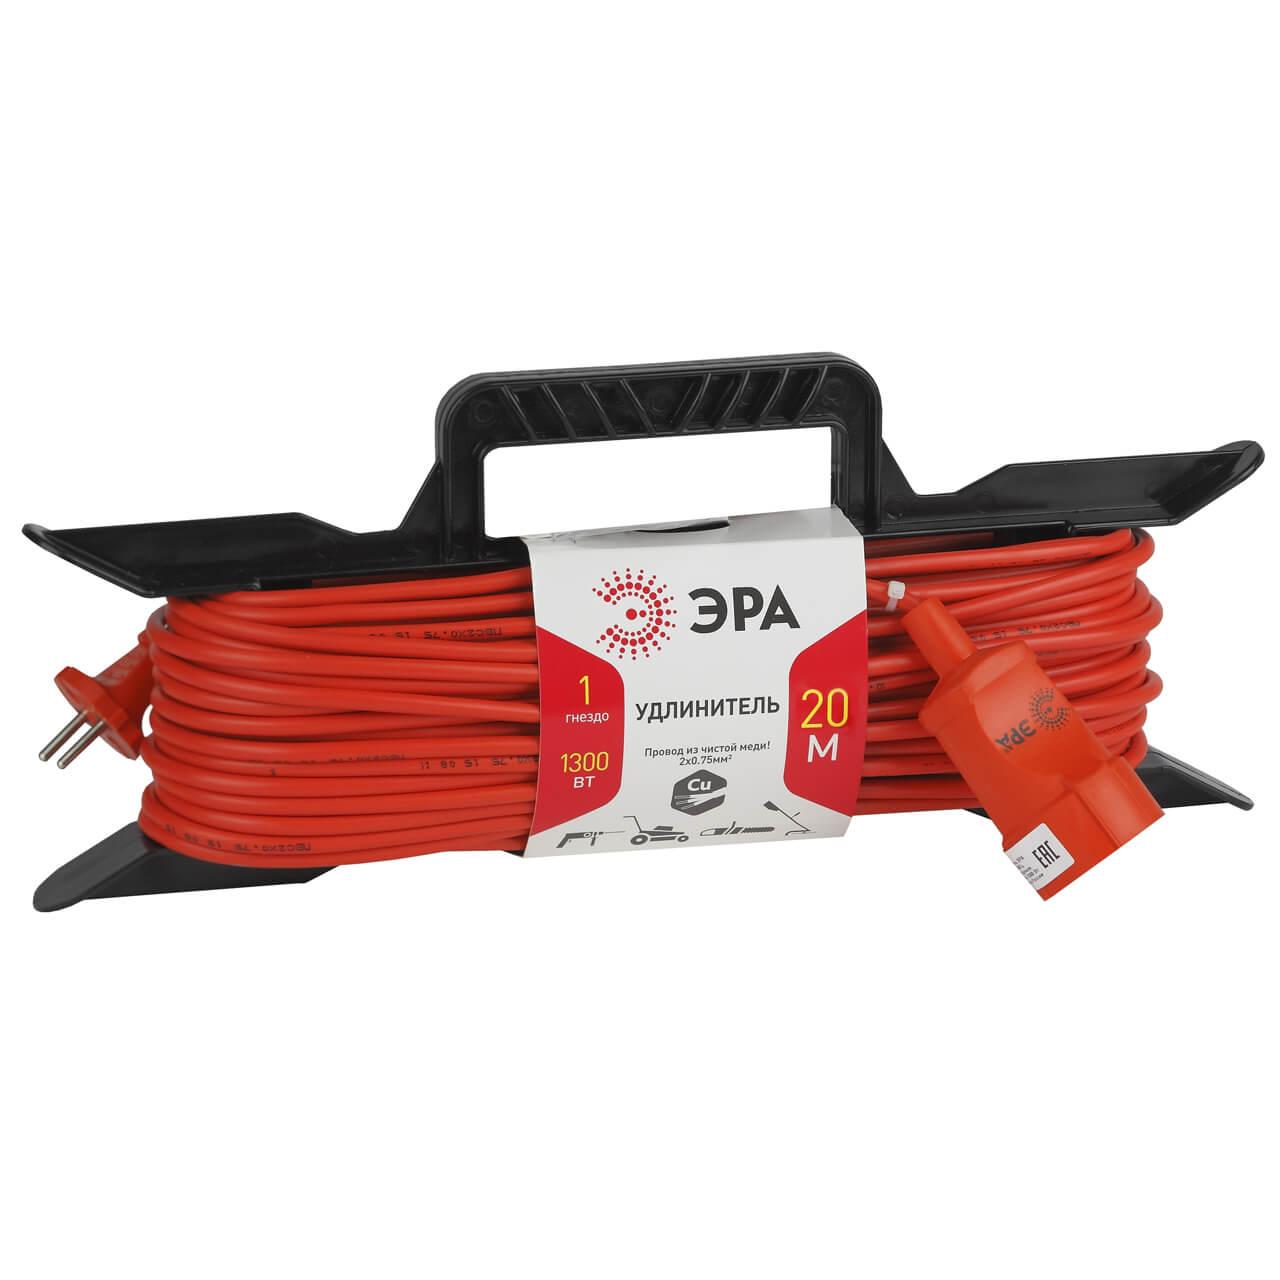 Удлинитель ЭРА UF-1-2x0.75-20m цена и фото